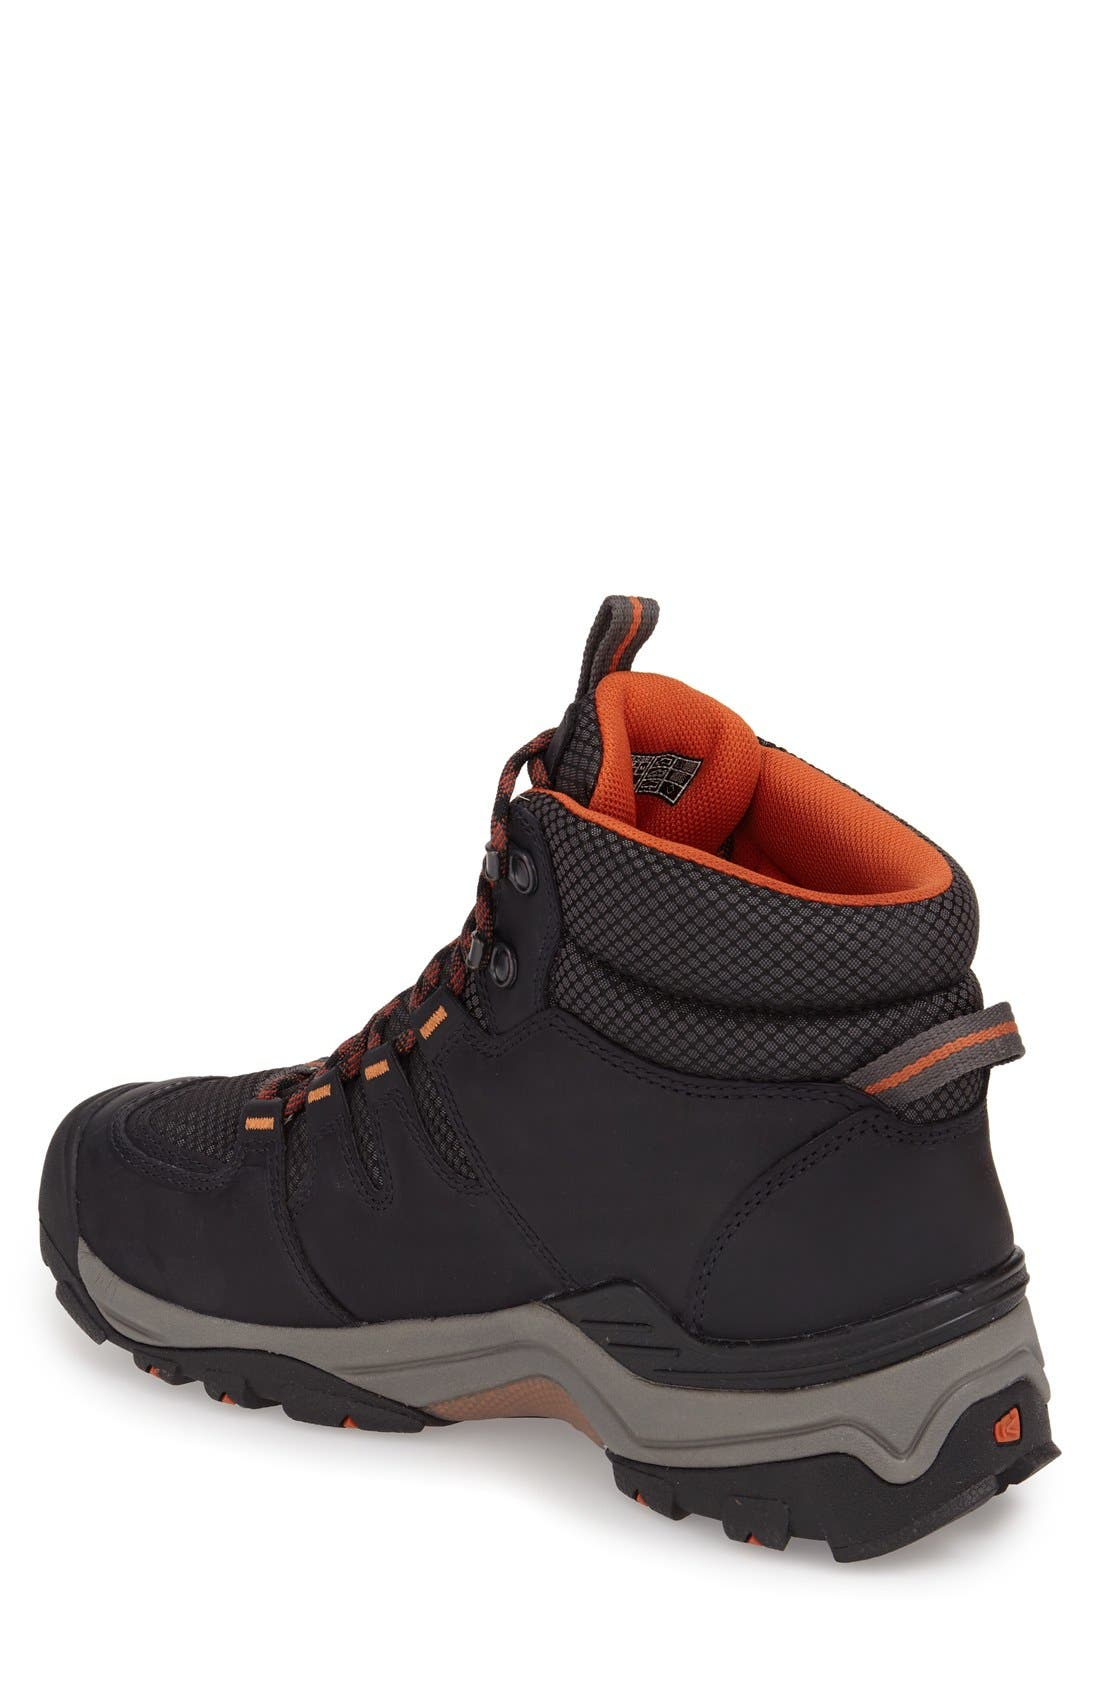 KEEN, Gypsum II Waterproof Hiking Boot, Alternate thumbnail 2, color, BLACK NUBUCK LEATHER